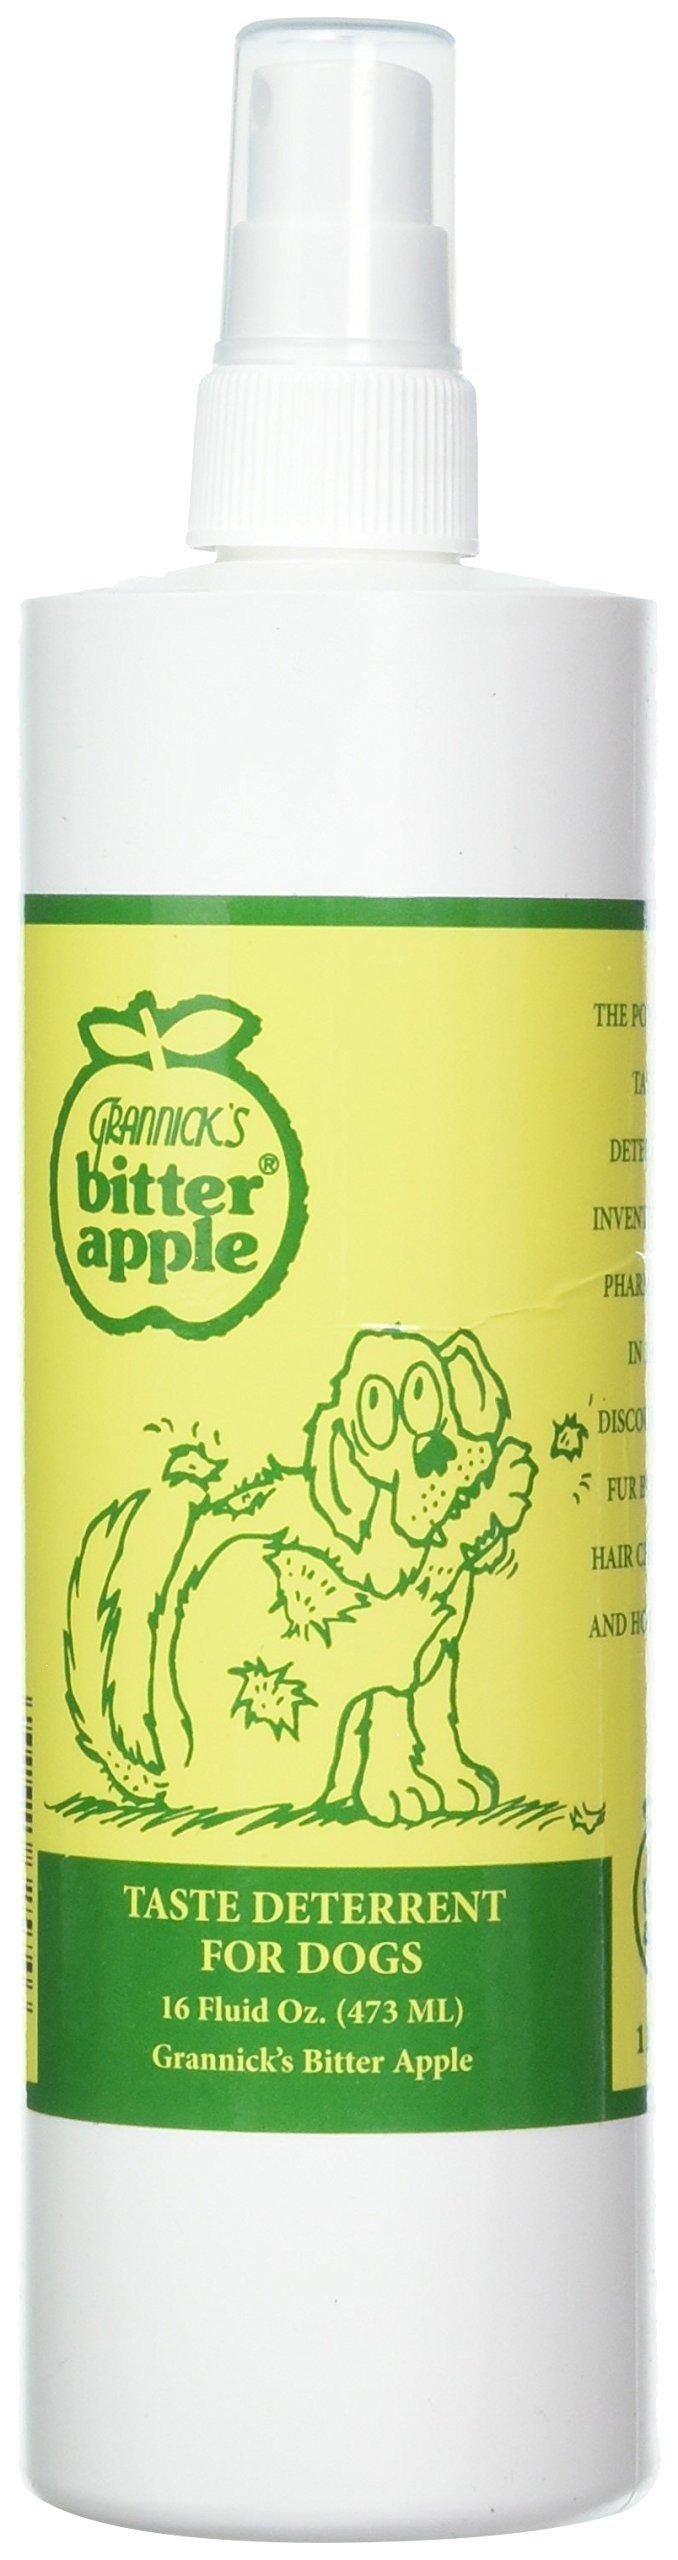 Grannick's Bitter Apple for Dogs Spray Bottle, 16 Ounces (2-Pack) by Grannick's